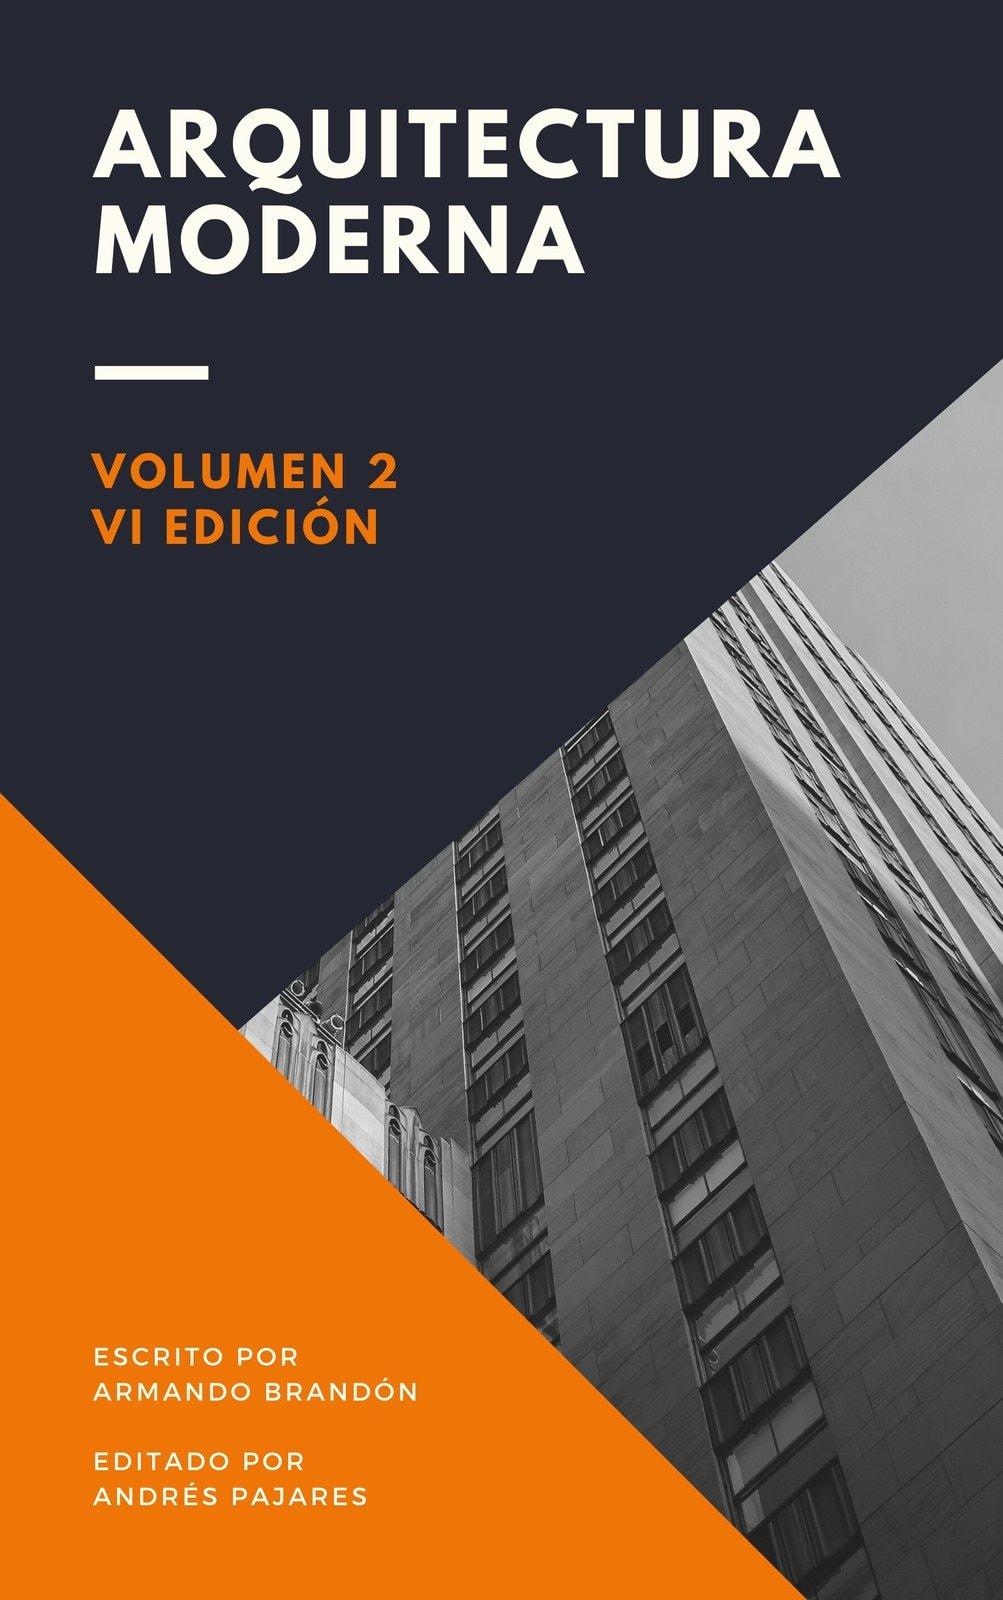 Portada de Libro Arquitectura Moderna Triangular Naranja y Morado Oscuro